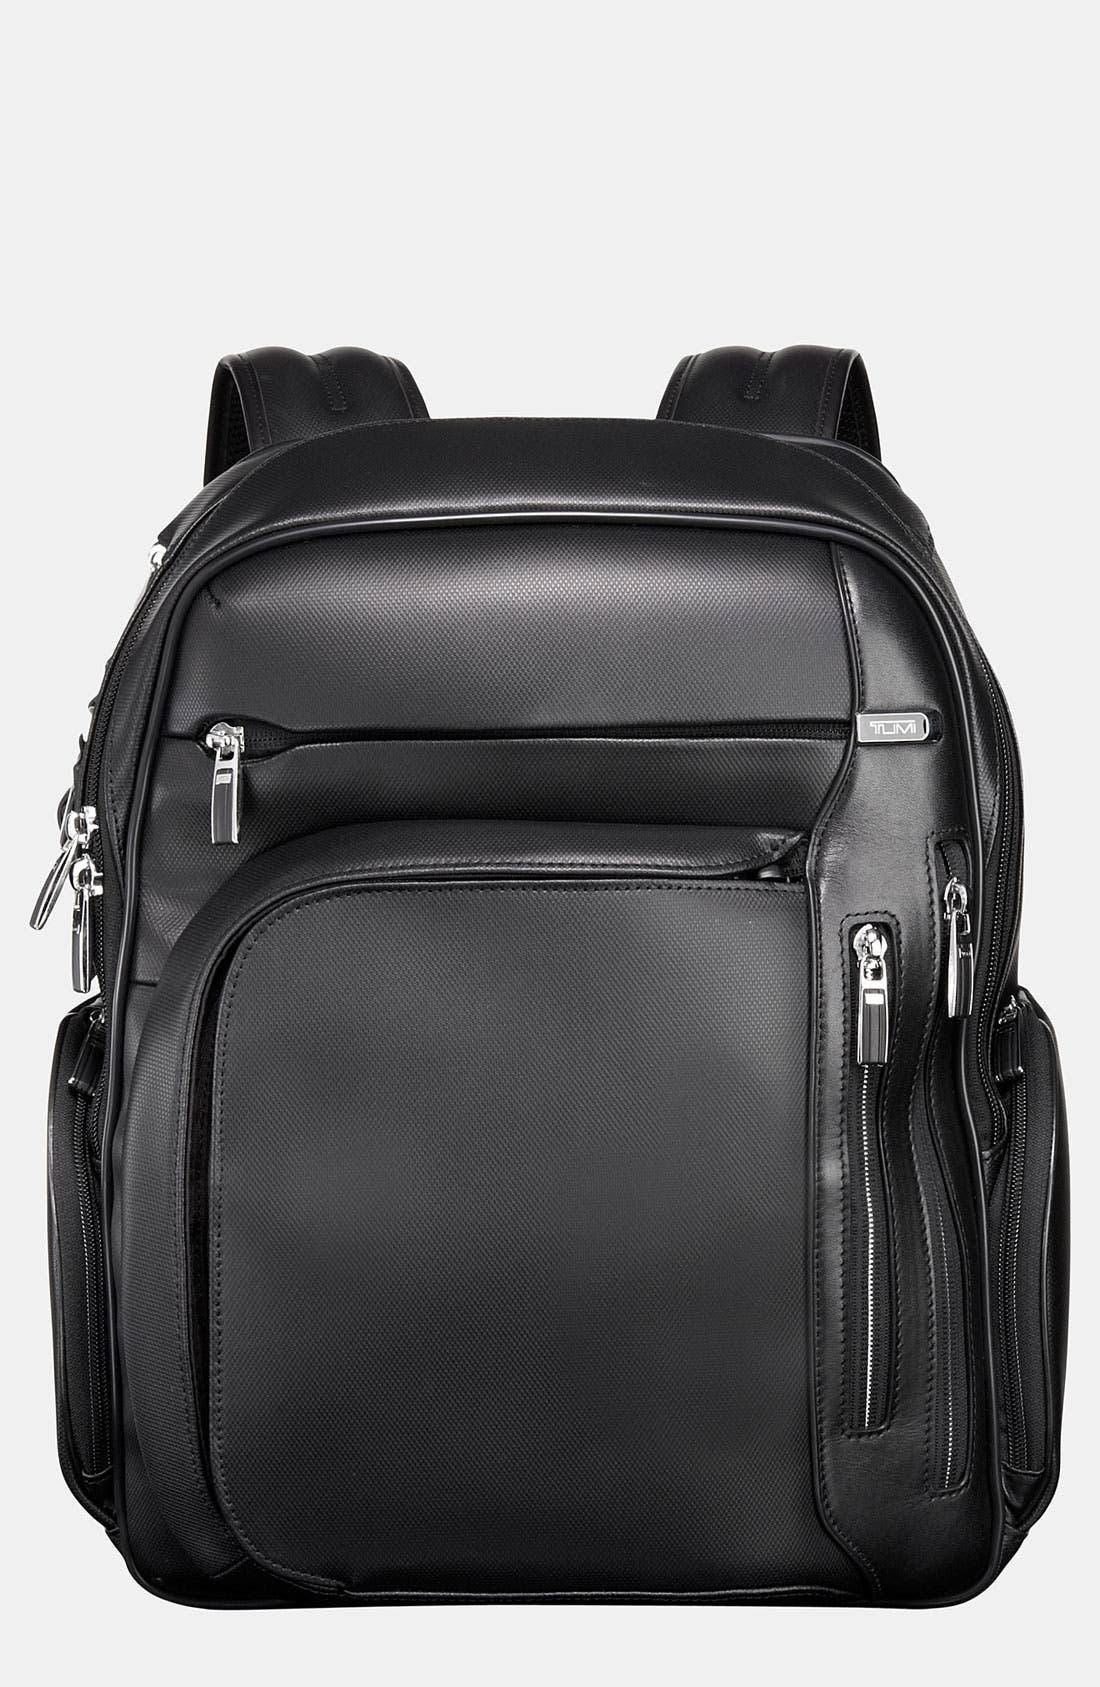 Main Image - Tumi 'Arrive - Kingsford' Leather Backpack